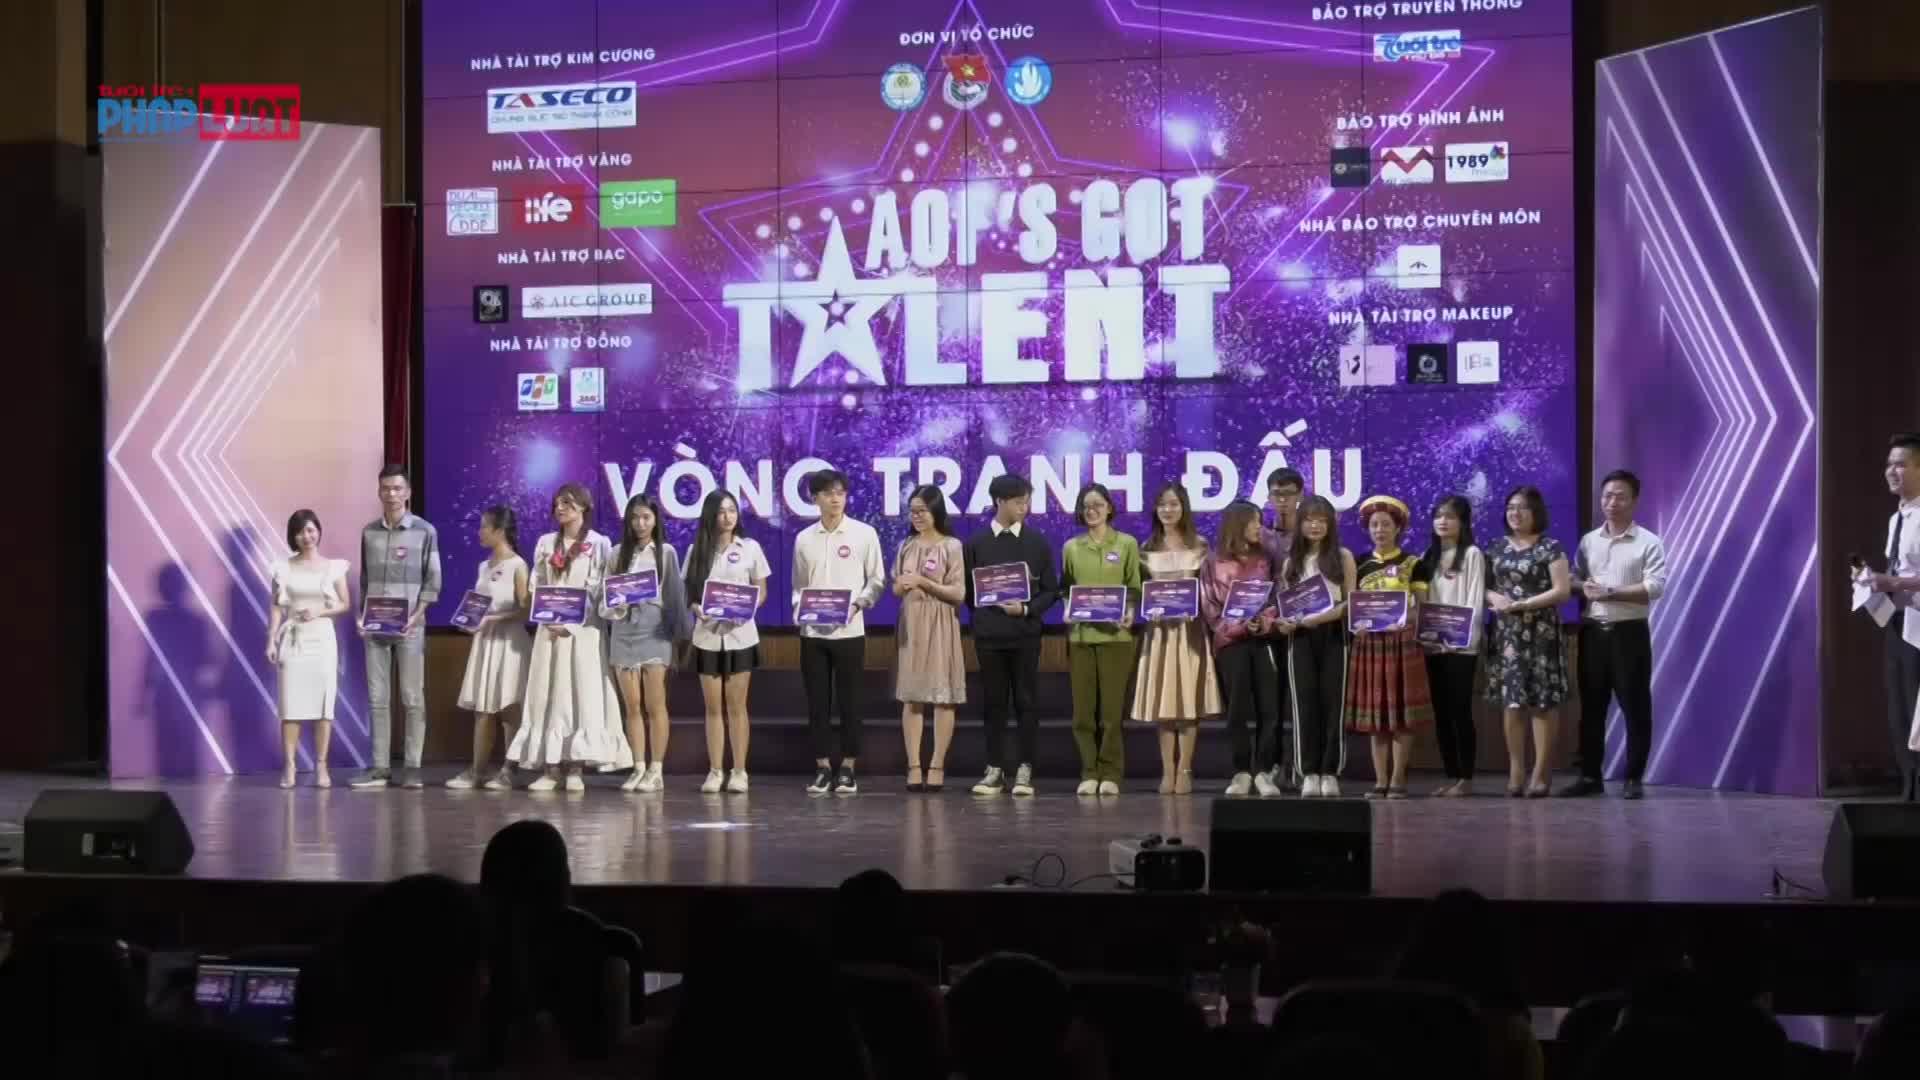 aofs got talent 2019 tranh dau de buoc tiep vao vong trong